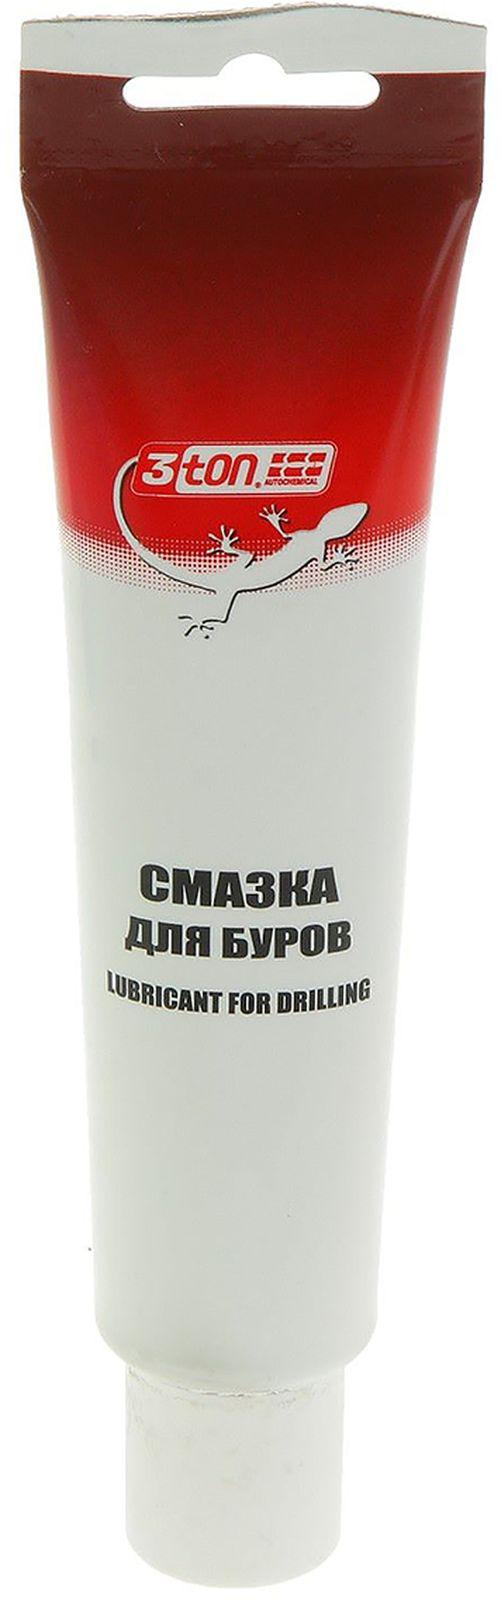 Смазка для буров 3TON, 100 г